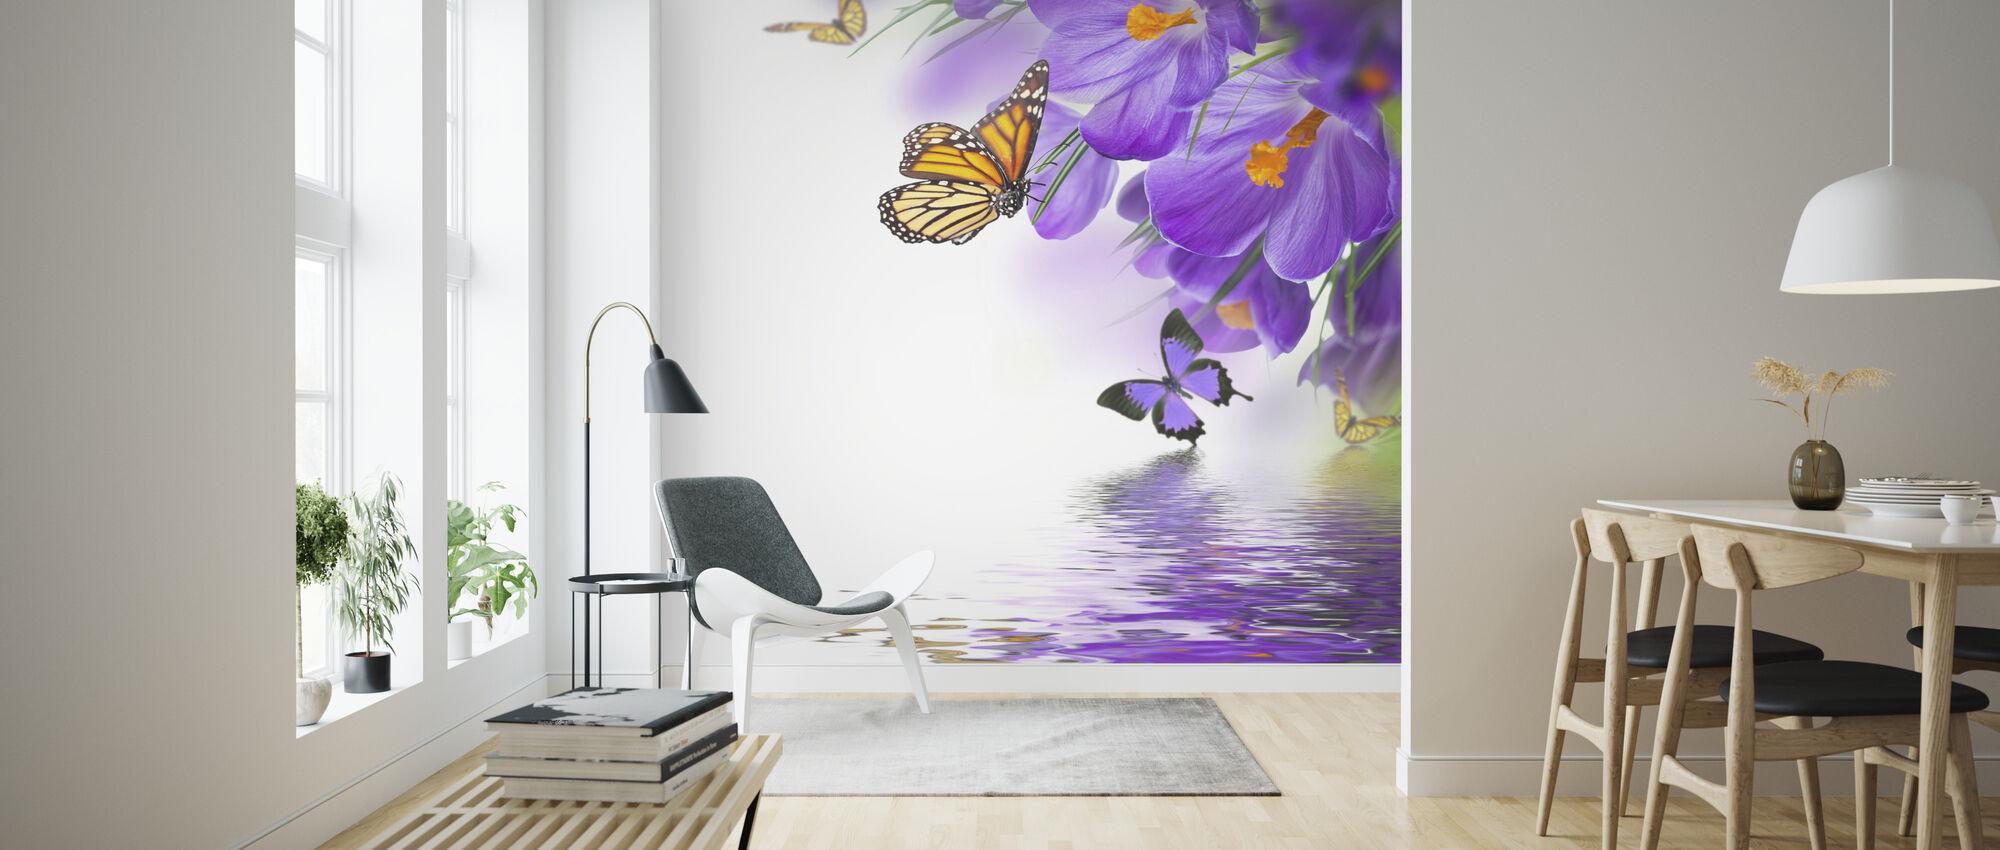 Vlinder Lente Krokussen - Behang - Woonkamer